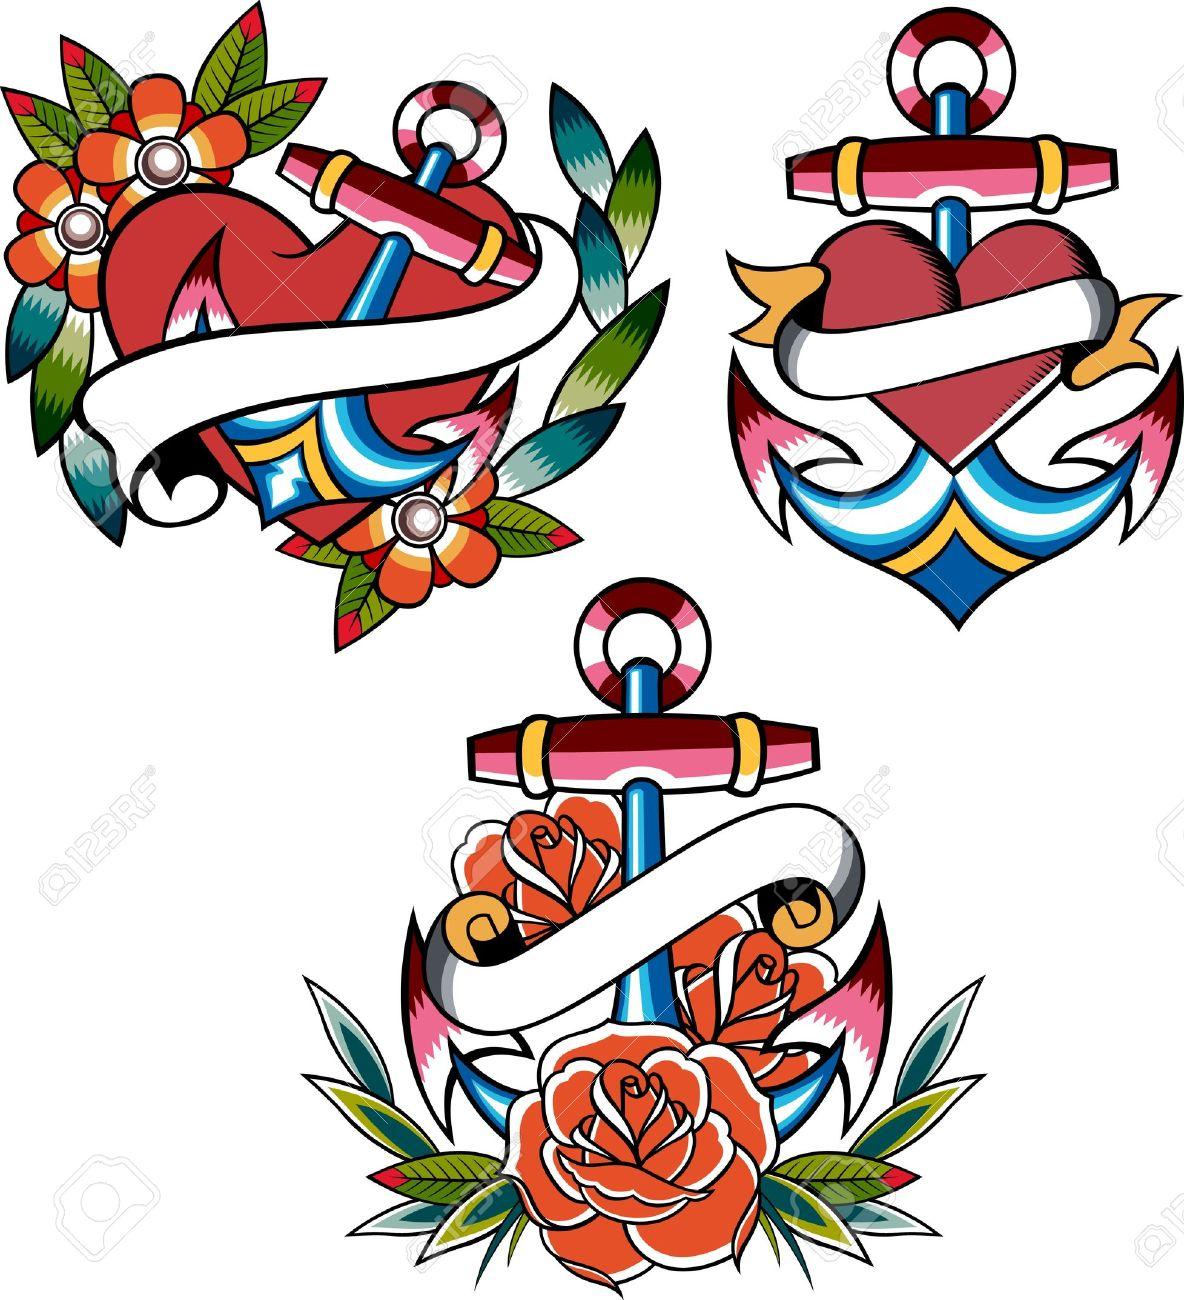 b63fdb526c590 ... Ed Hardy Anchor Tattoos: Tatuajes: Anclas Significado Y Diseños